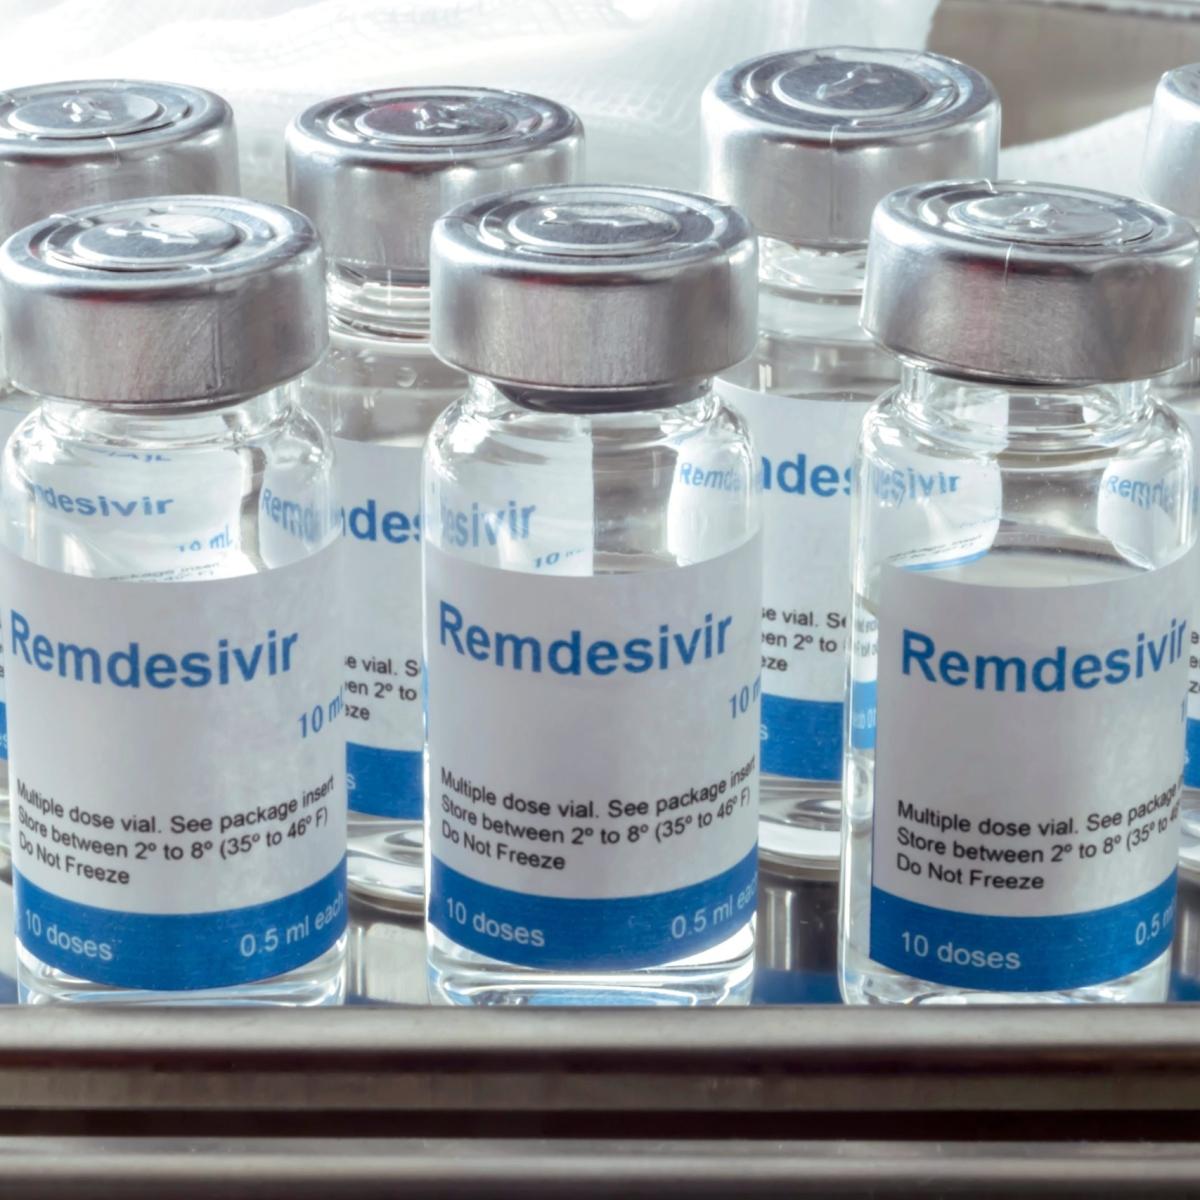 Amid COVID-19 case spike, Remdesivir row, Maharashtra FDA chief Abhimanyu Kale transferred